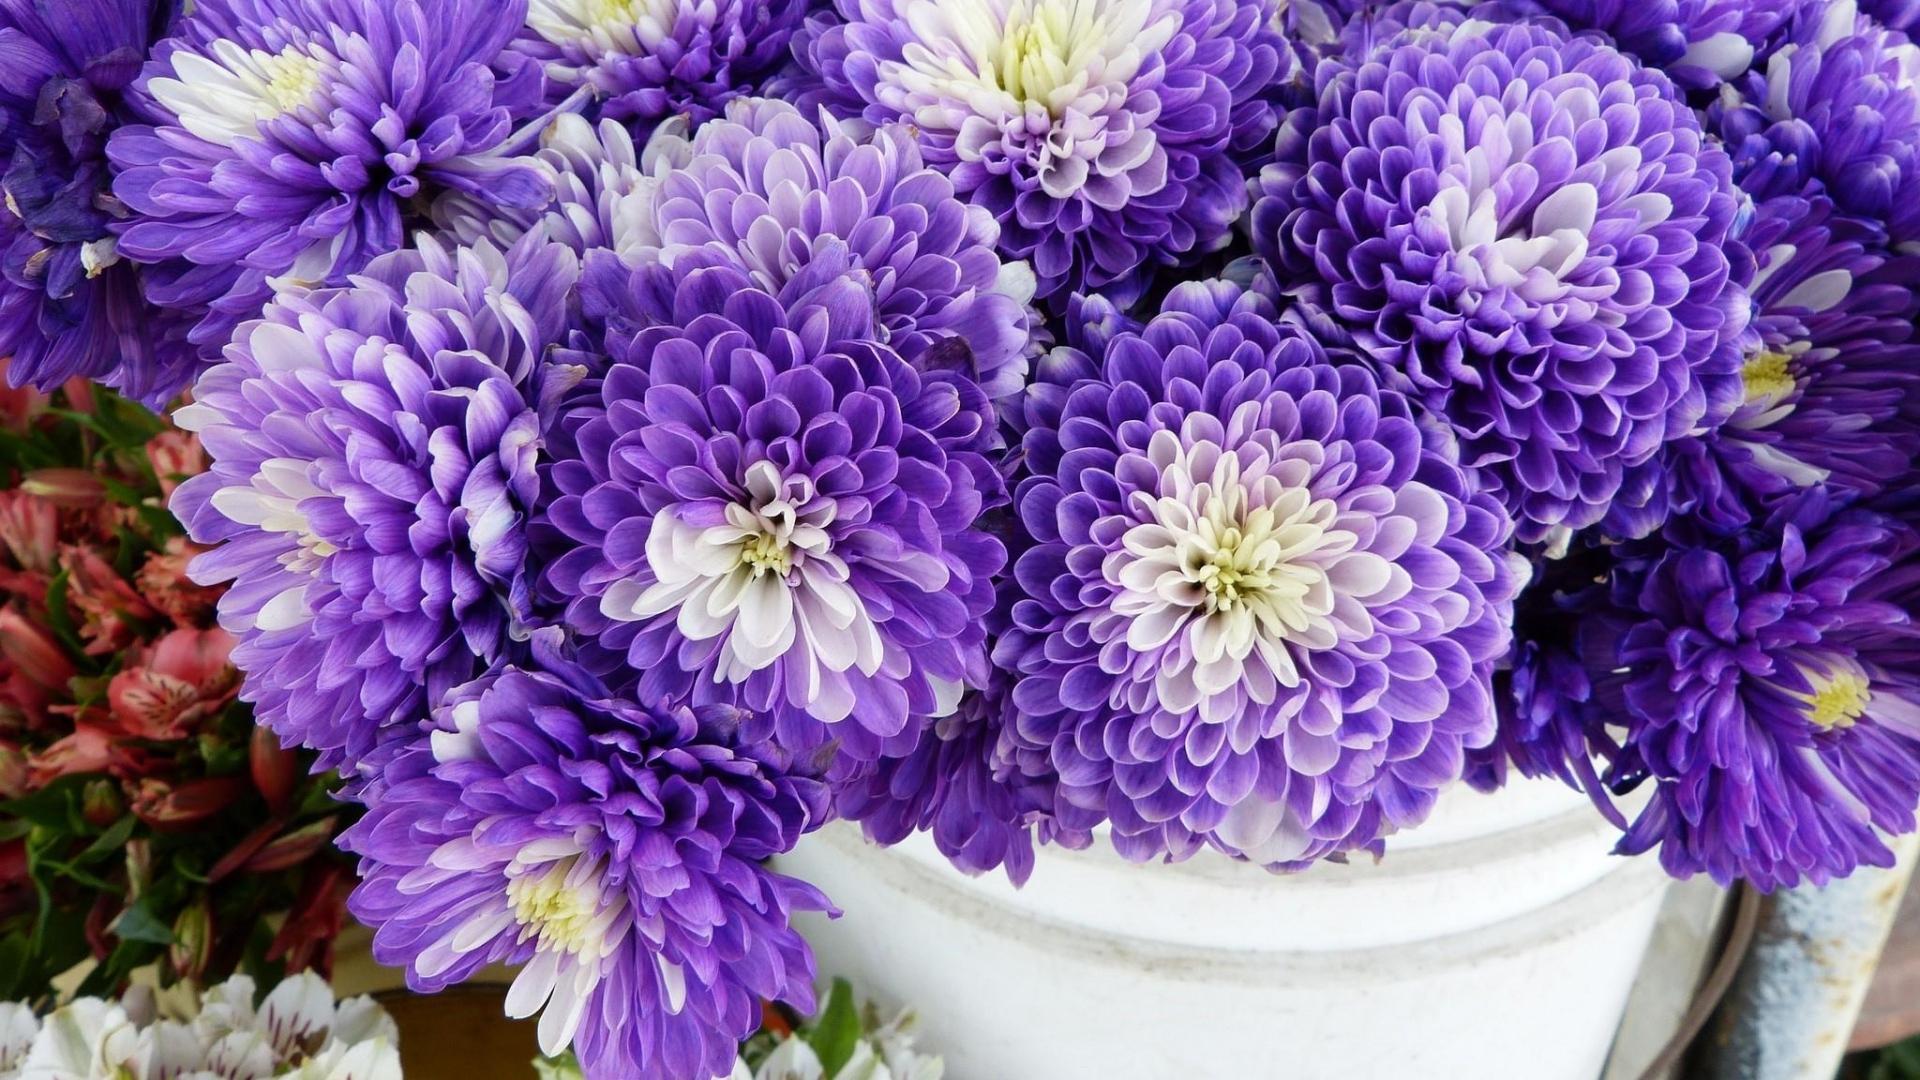 Цветы картинки хризантемы